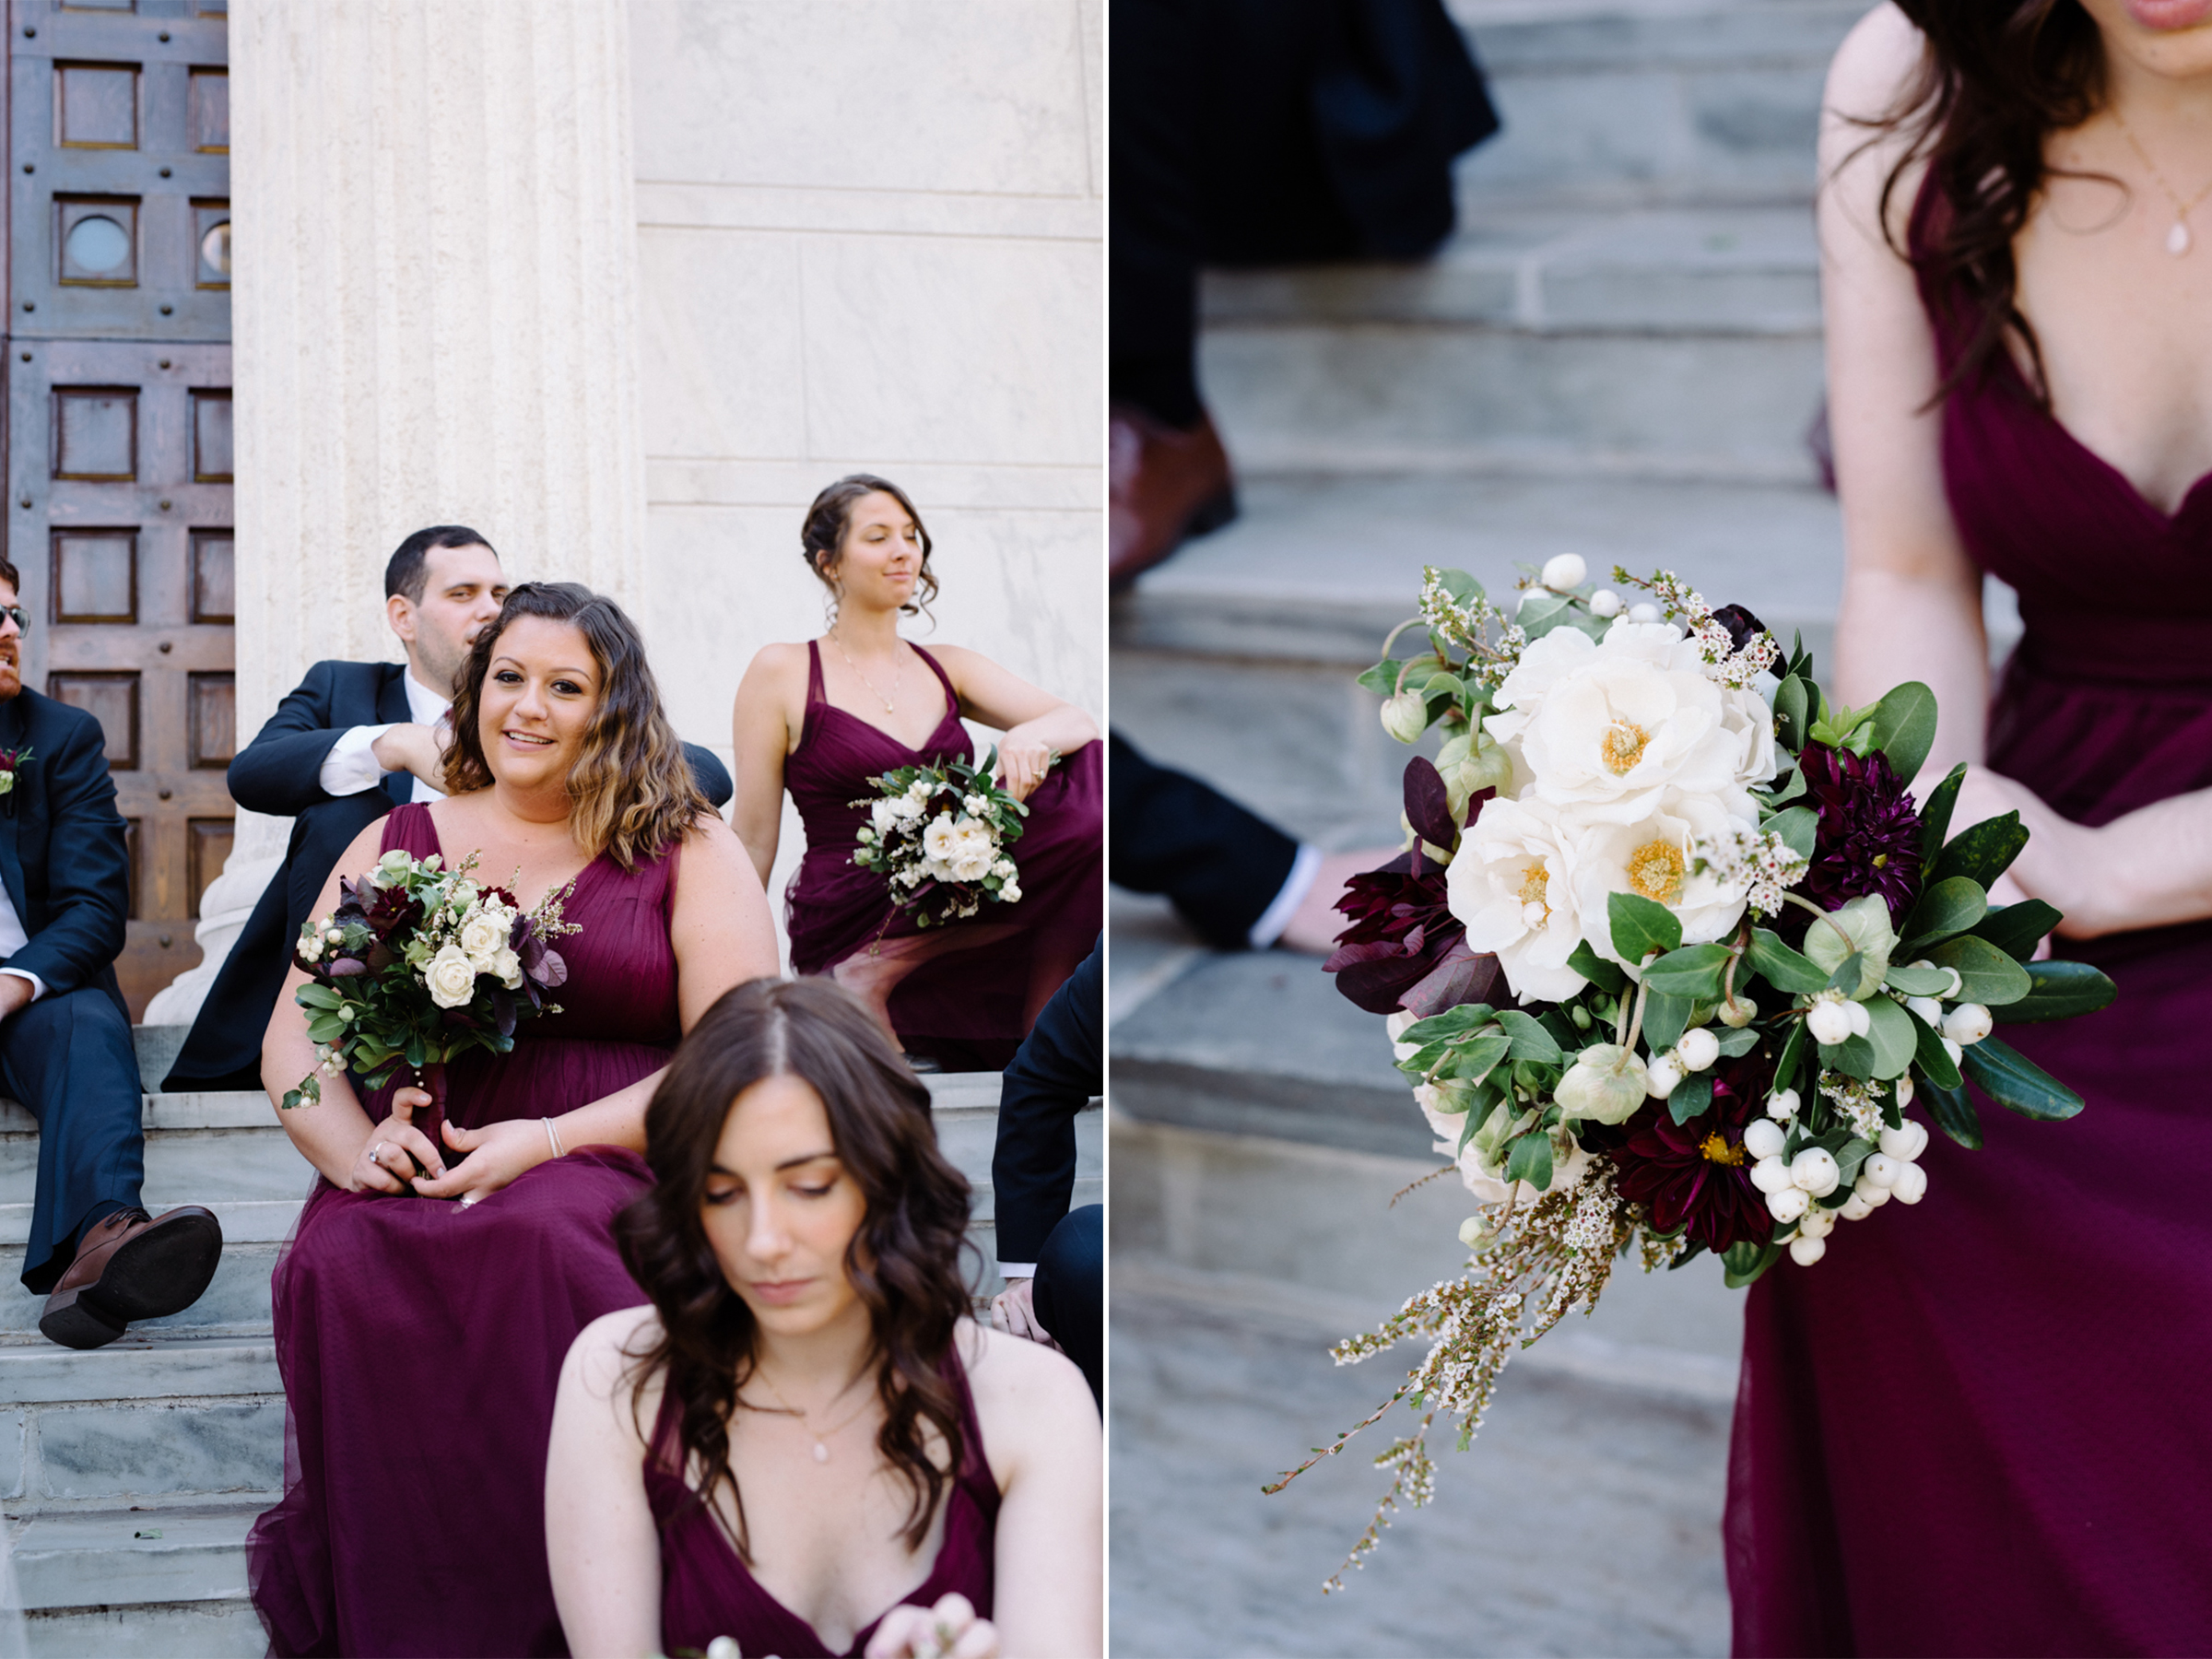 Chelsea+James- Bridal Party Bouquets Maroon- Dark Fall Wedding Colors- Viburnum Designs- Princeton Wedding- Olivia Christina Photo.jpg